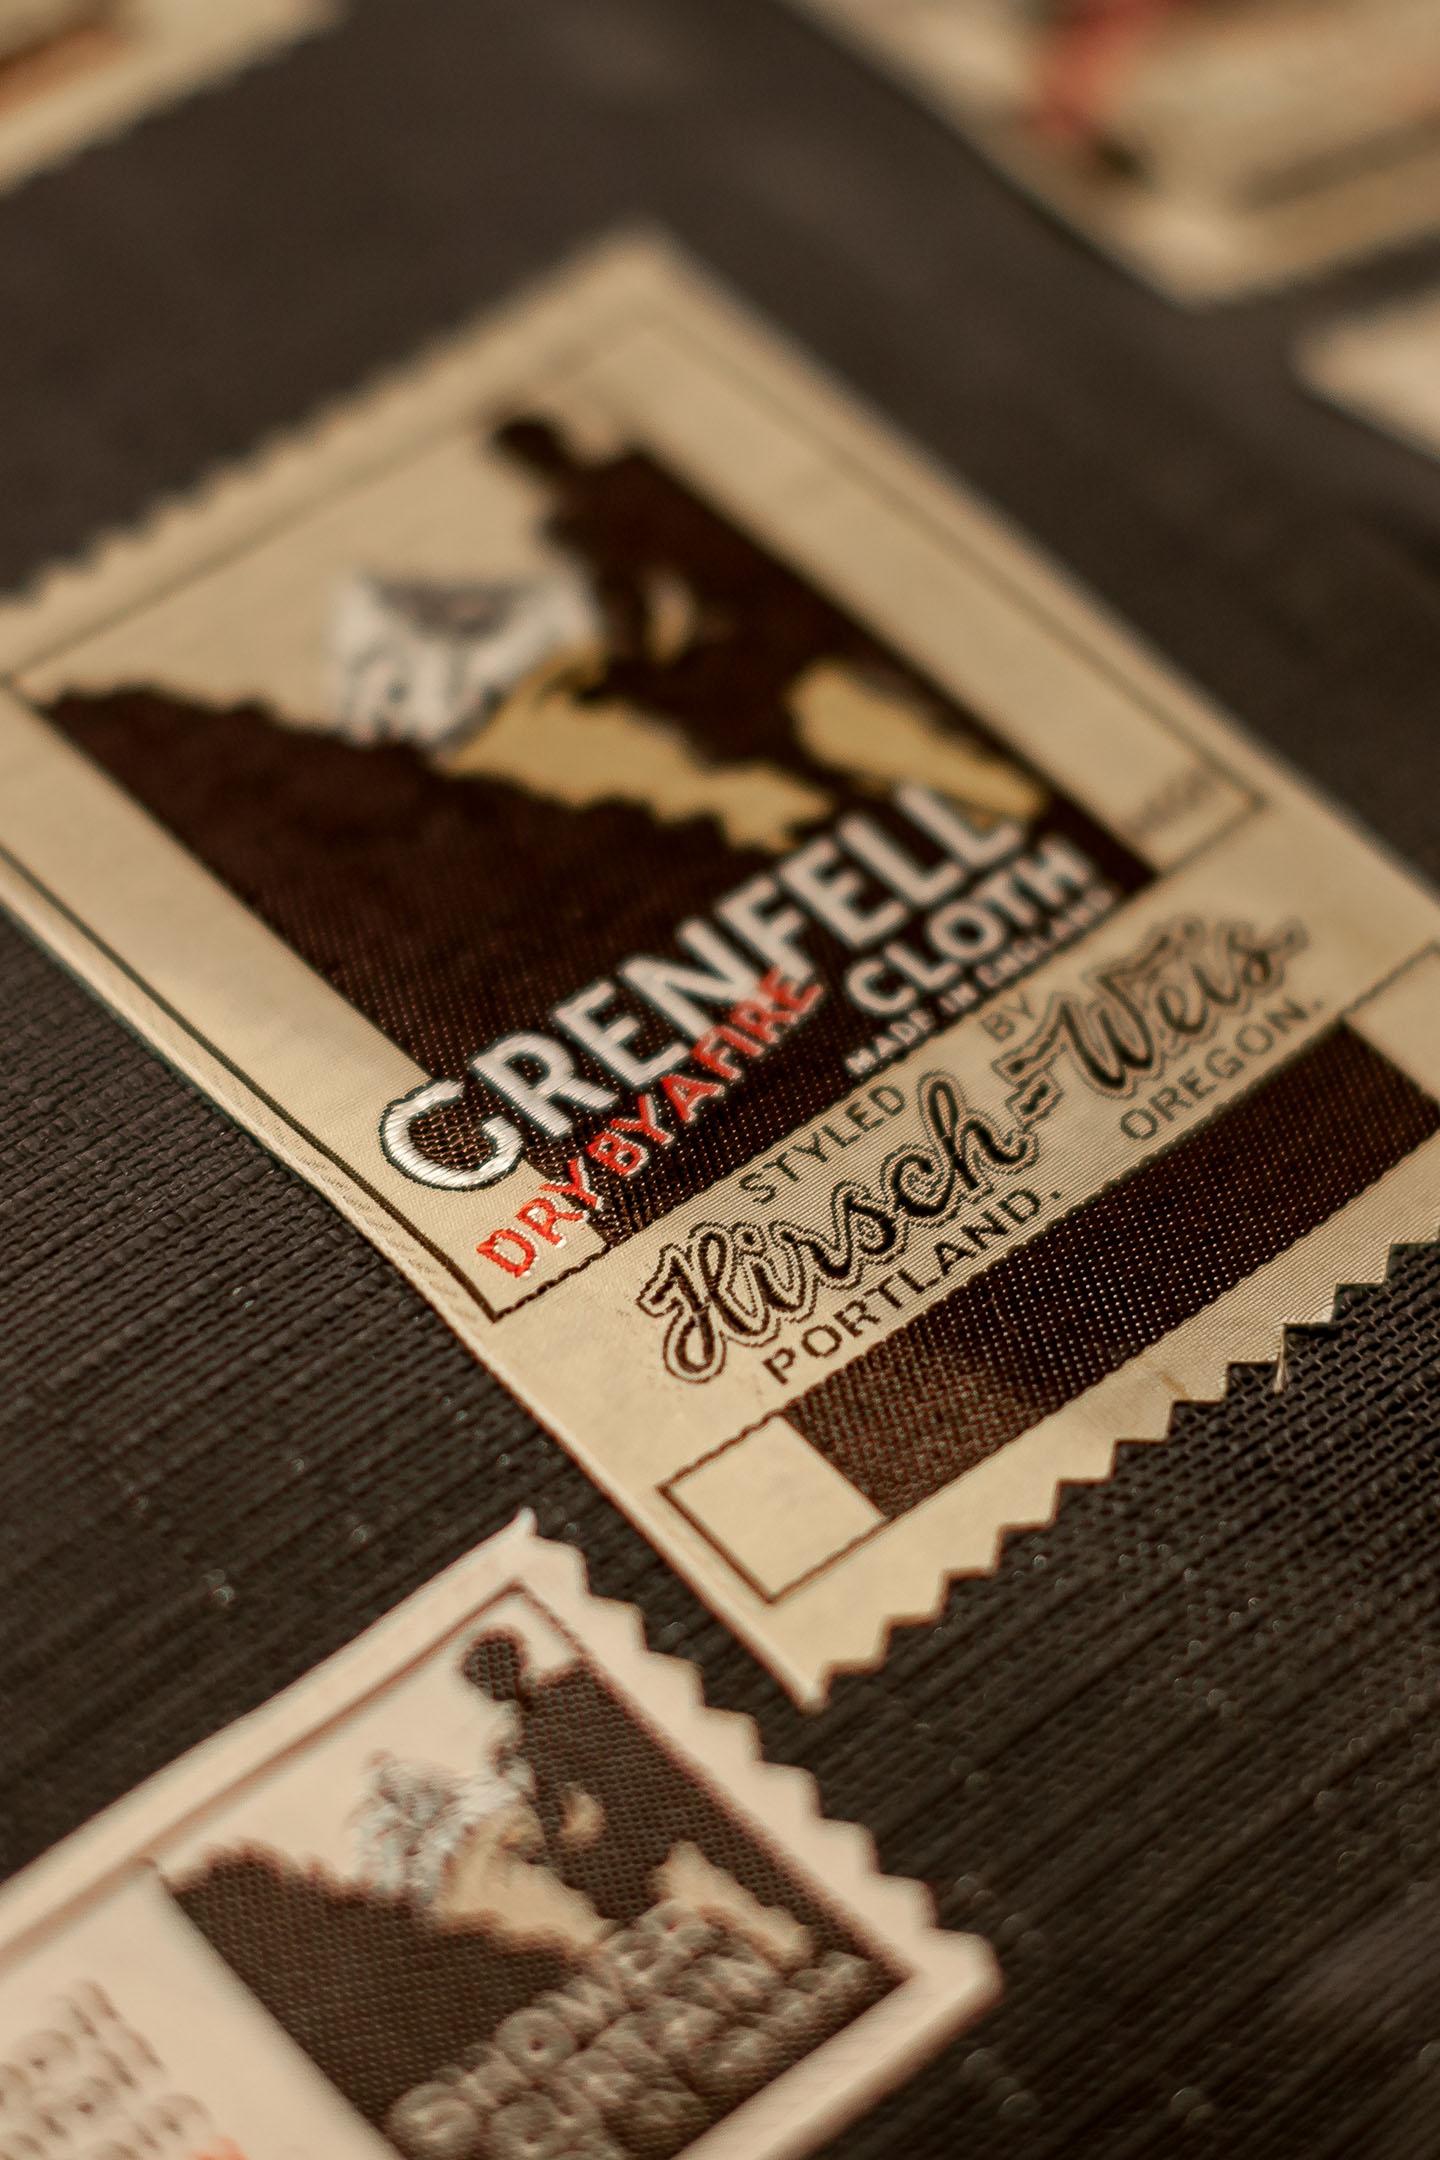 GRENFELL RETRO BRAND CLOTHING TAG